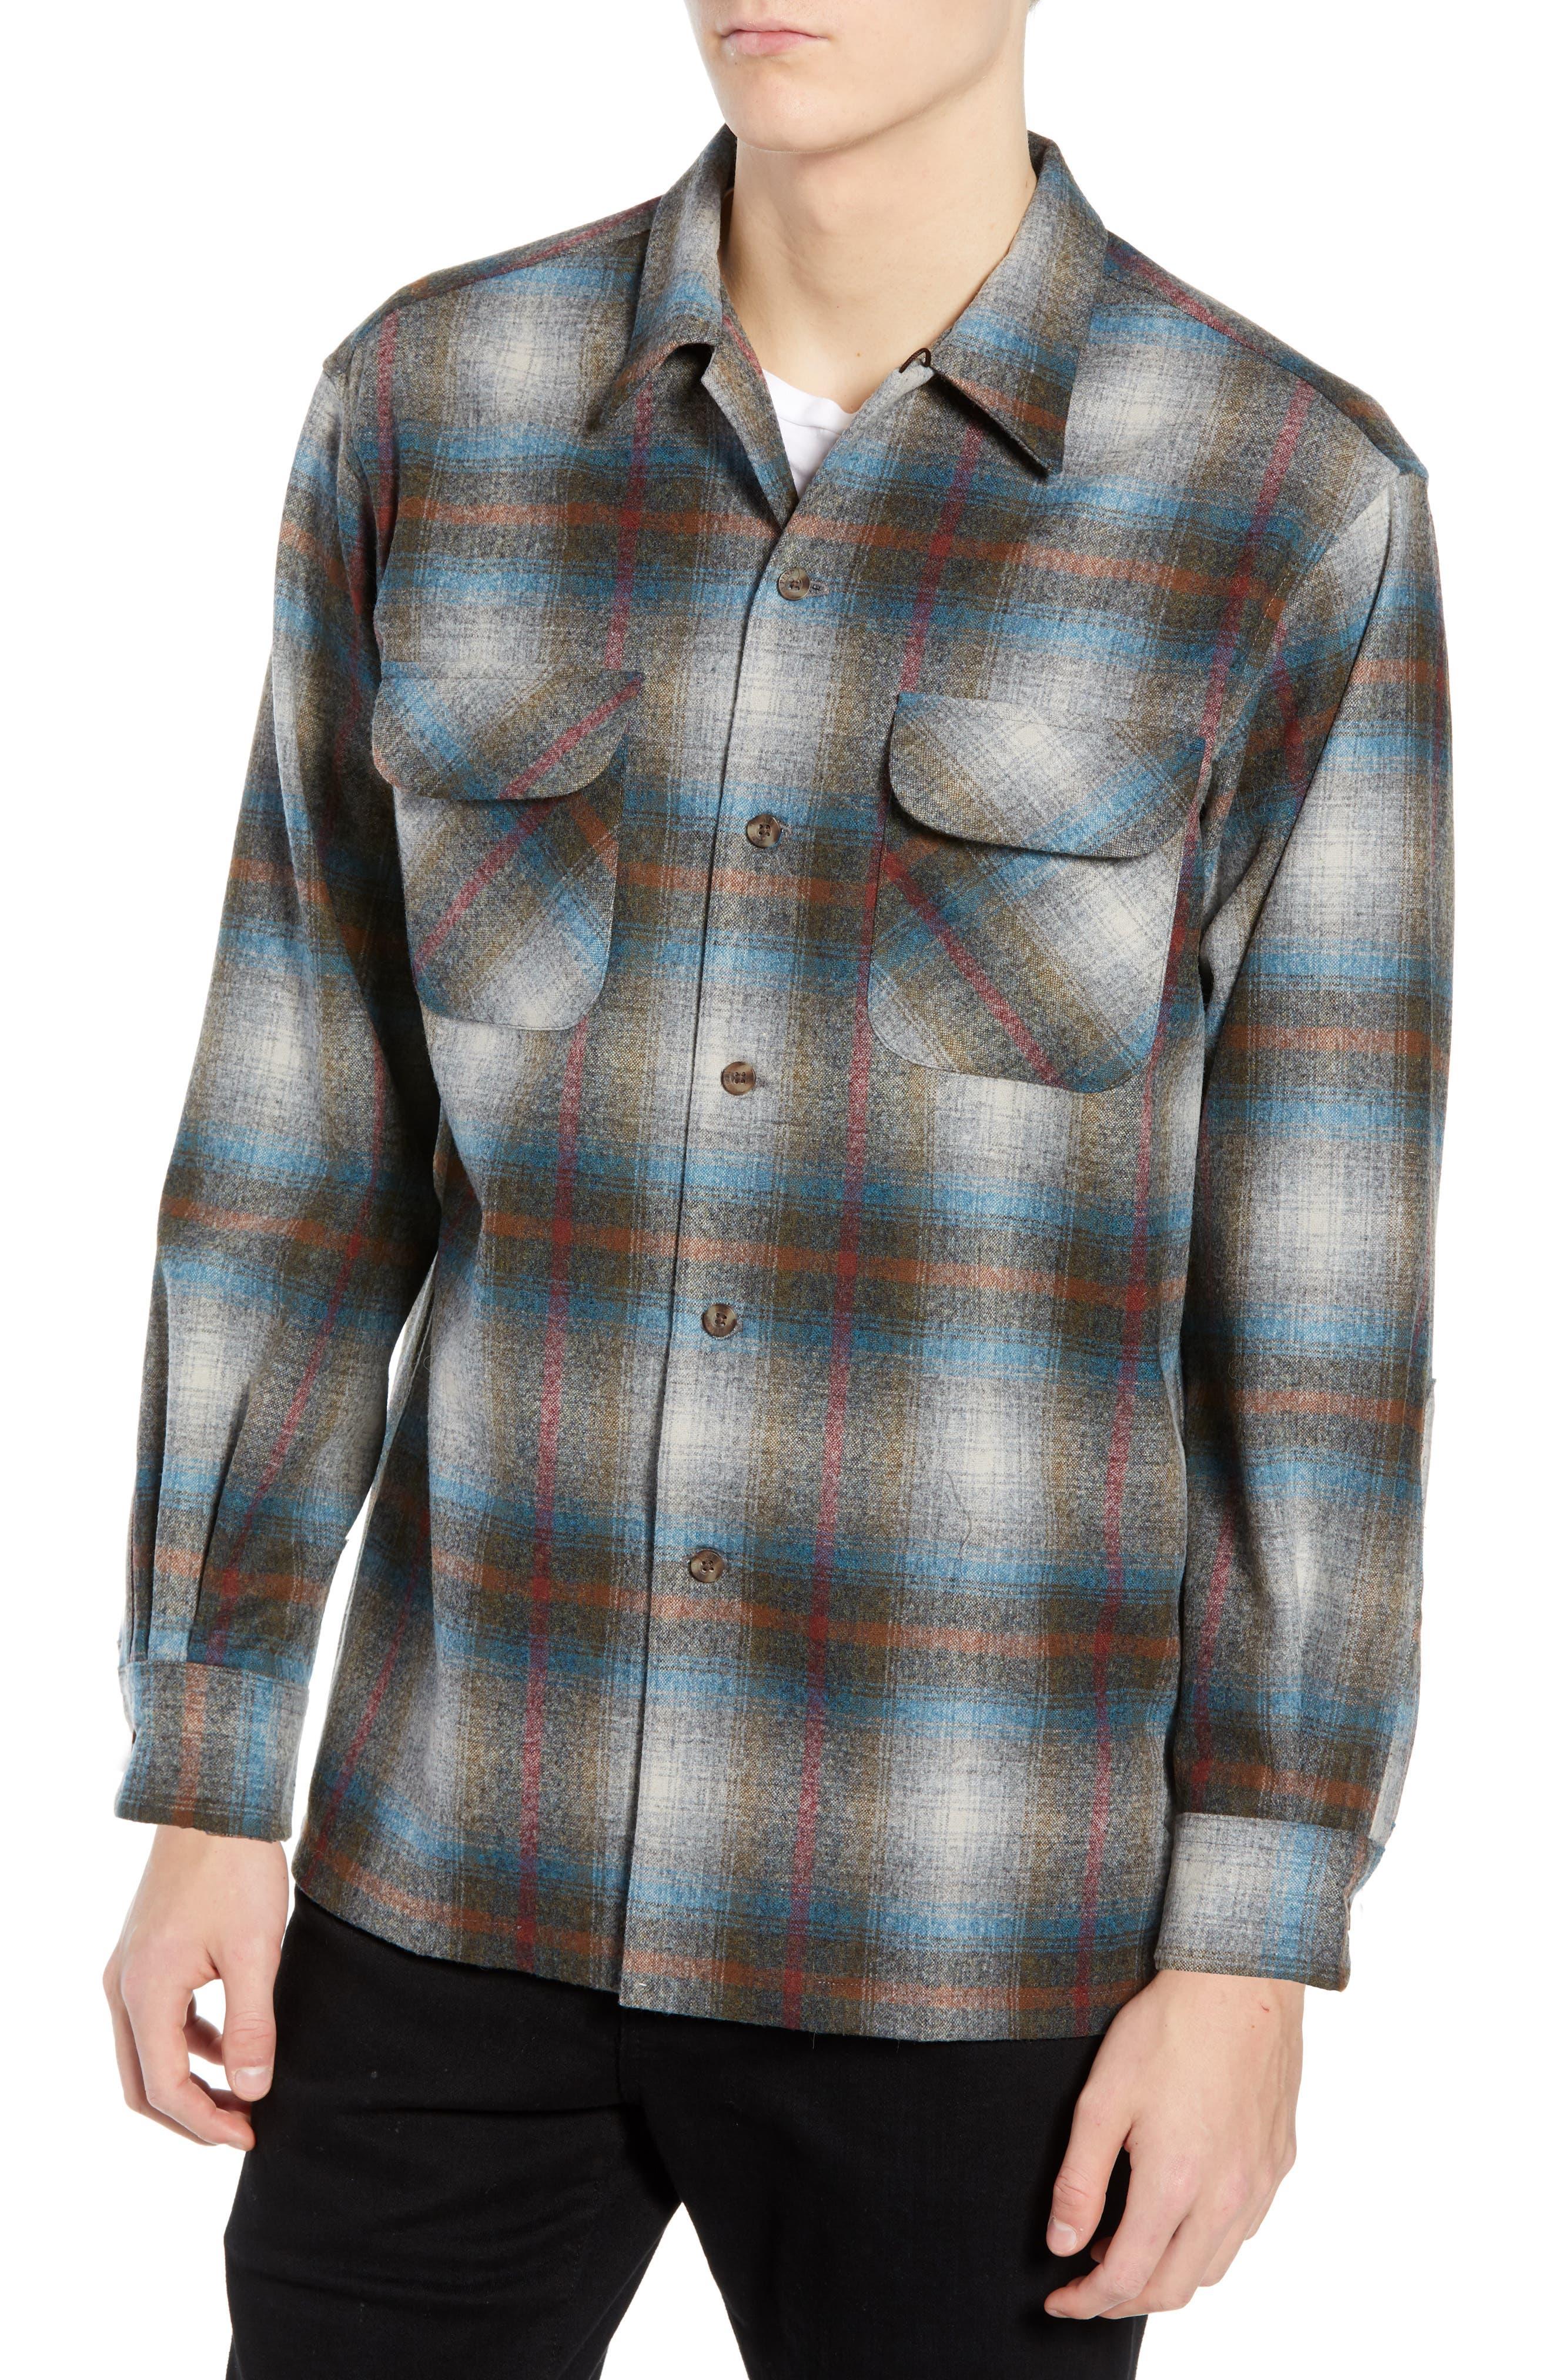 PENDLETON Board Wool Flannel Shirt in Multi Plaid